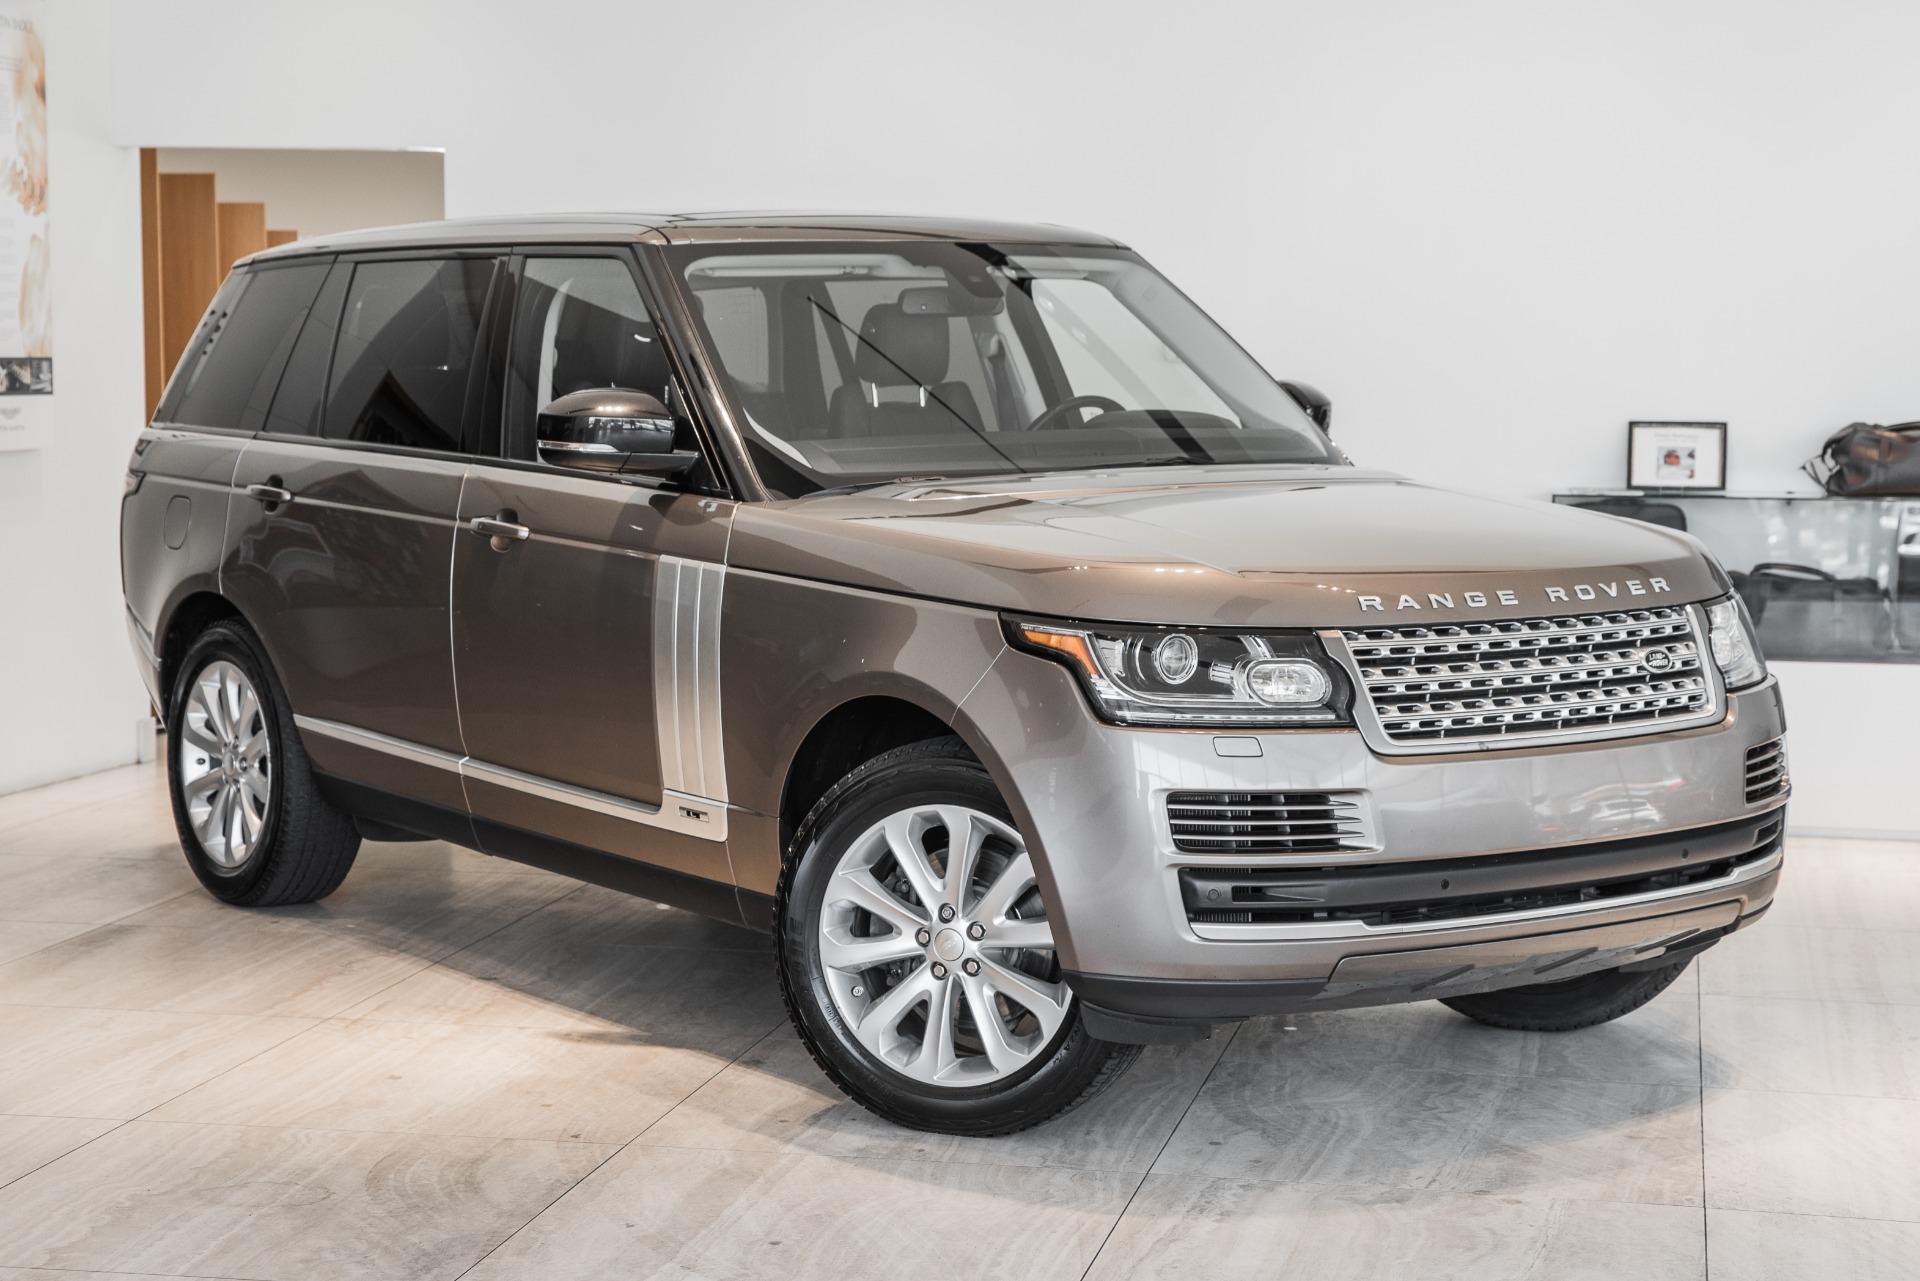 Used 2015 Land Rover Range Rover HSE LWB | Vienna, VA